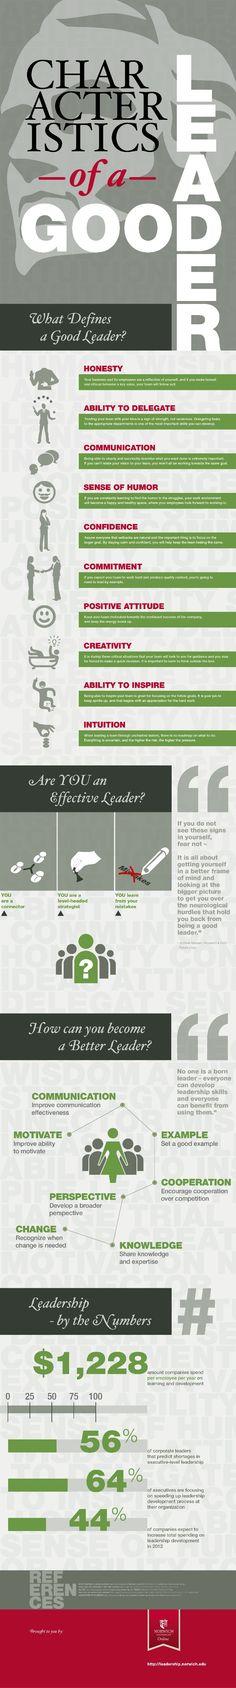 Characteristics of a Good Leader